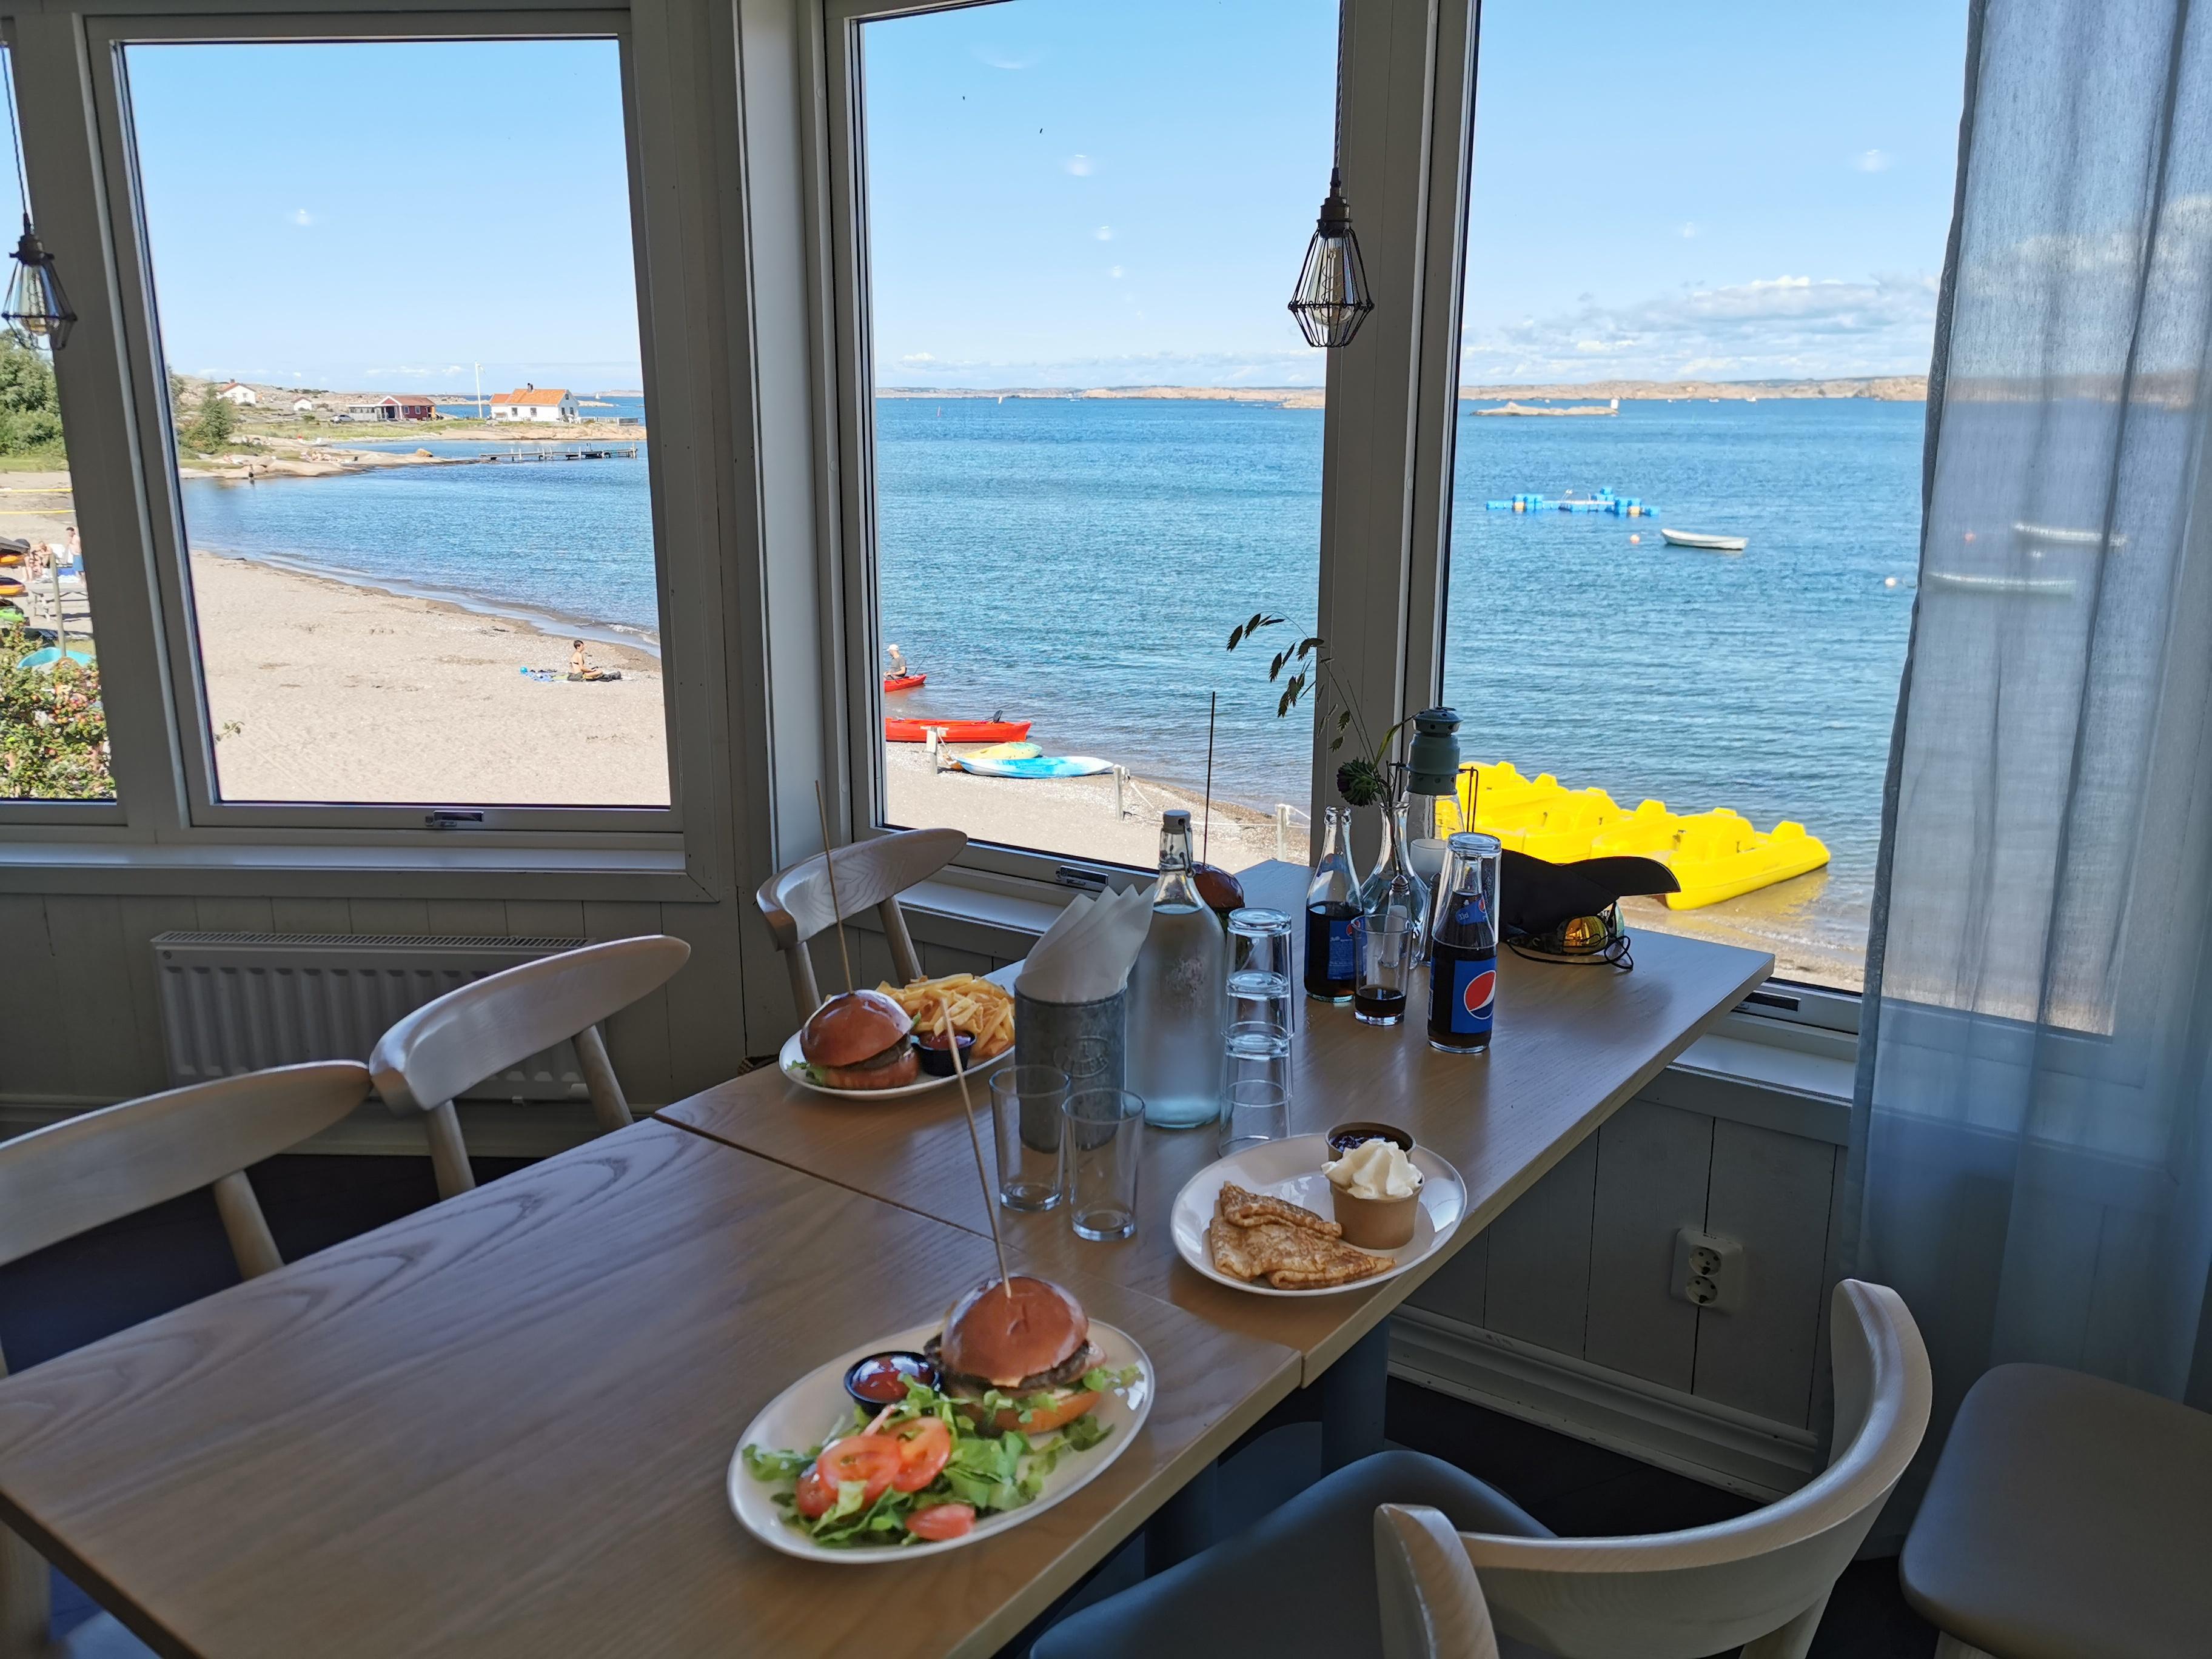 Ramsviks restaurang havsutsikt